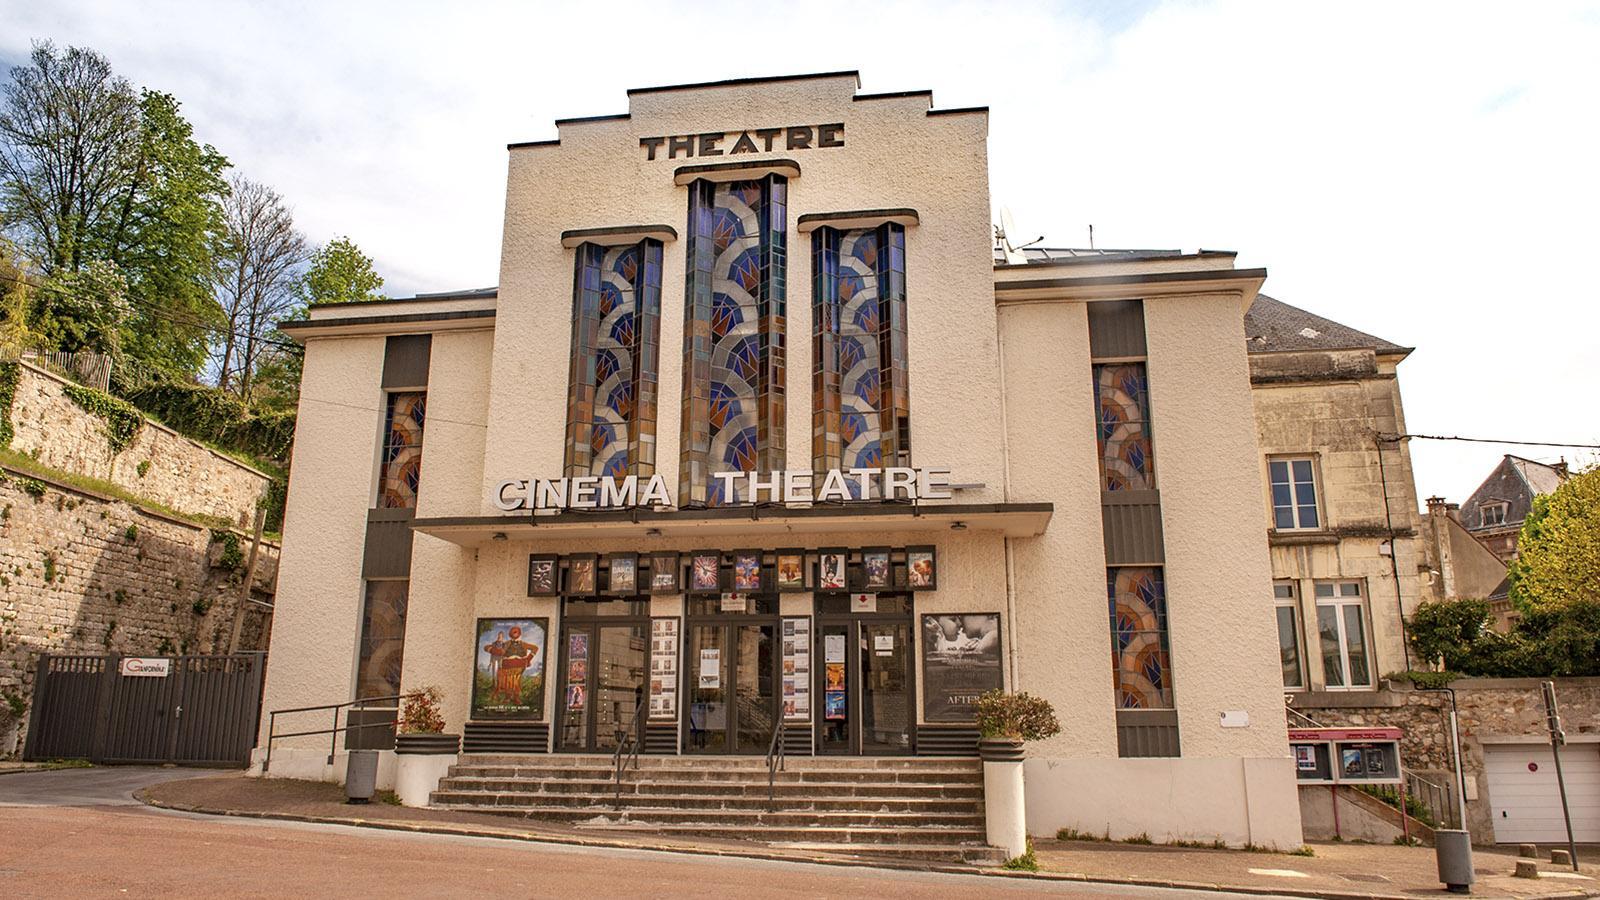 Château-Thierry: Art Deco am Rathausplatz - das Kino. Foto: Hilke Maunder